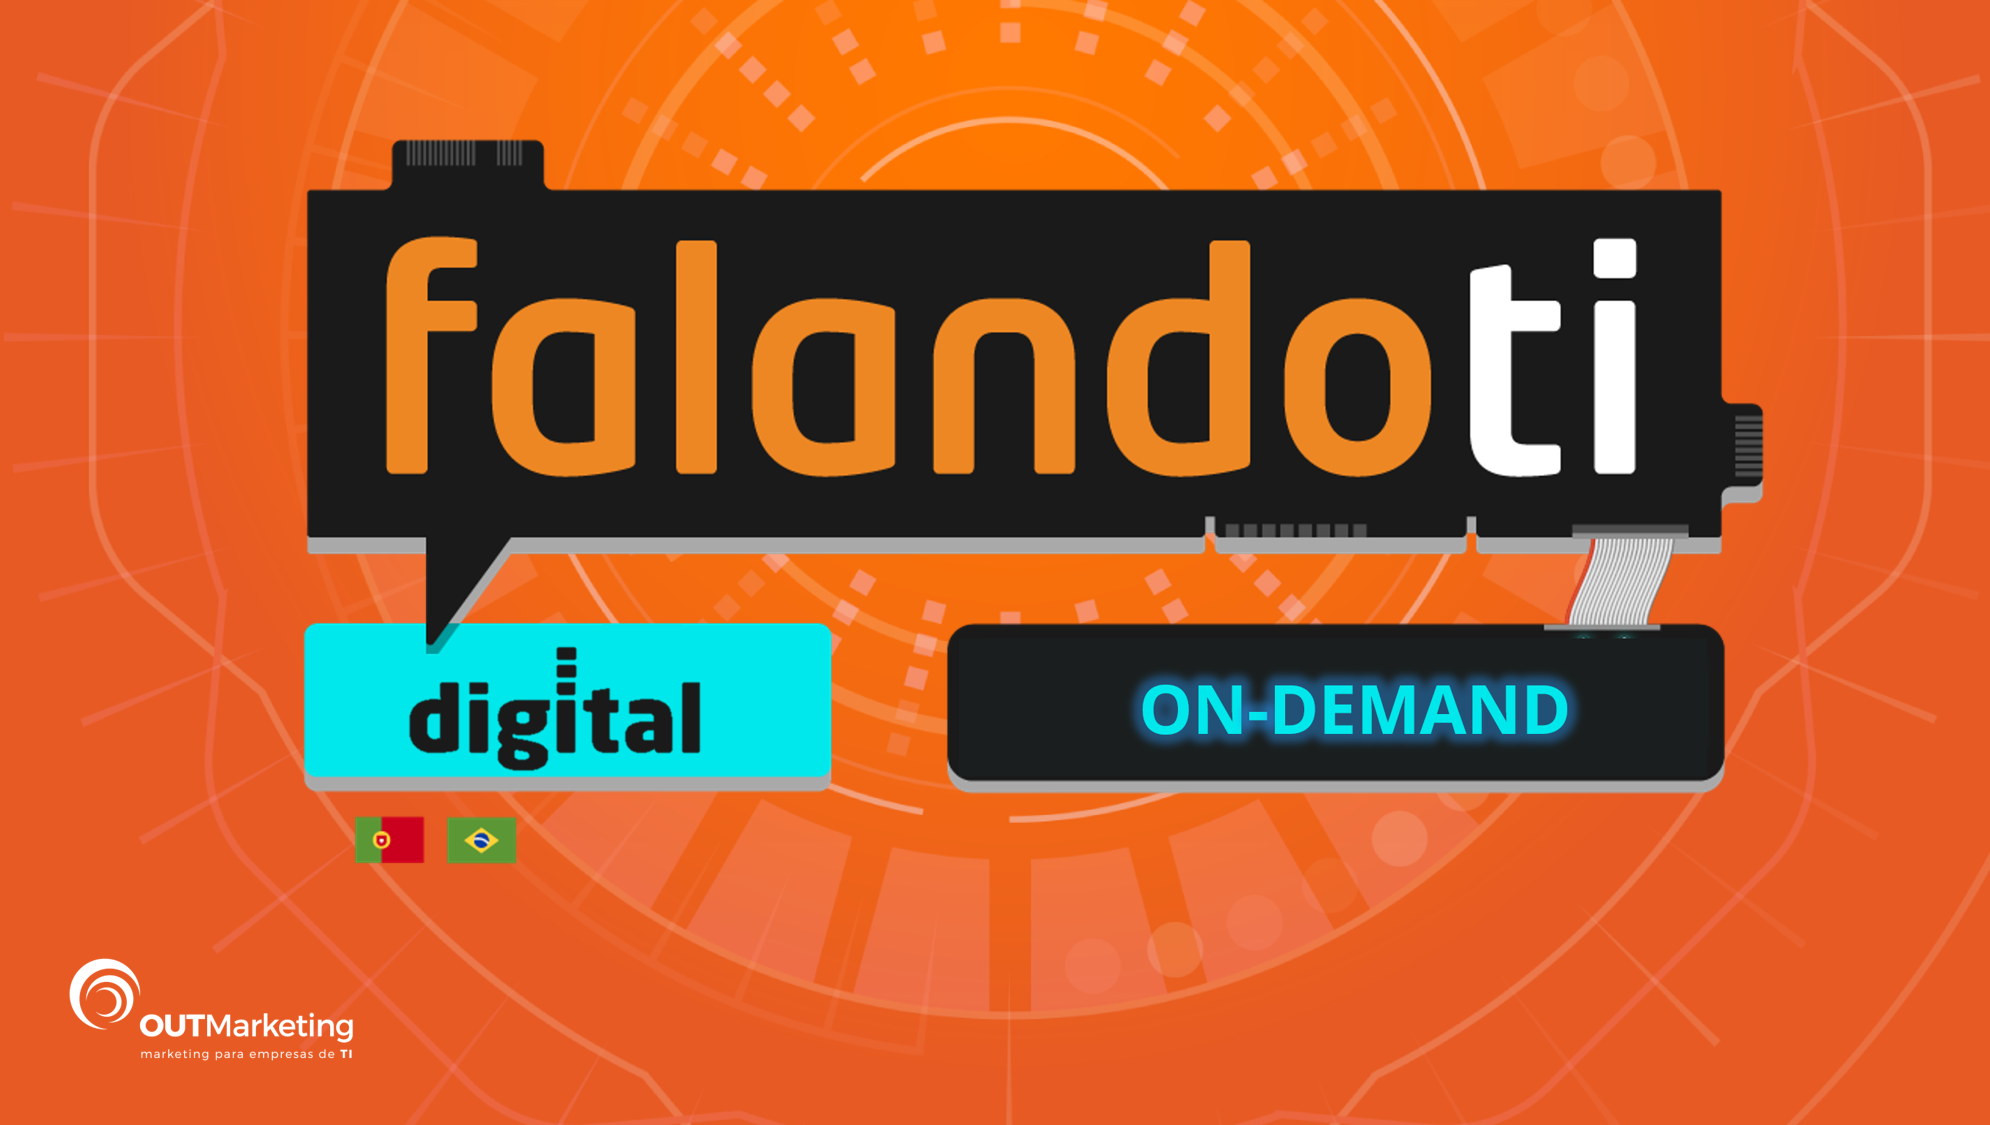 falandoti_digital_demand-fb